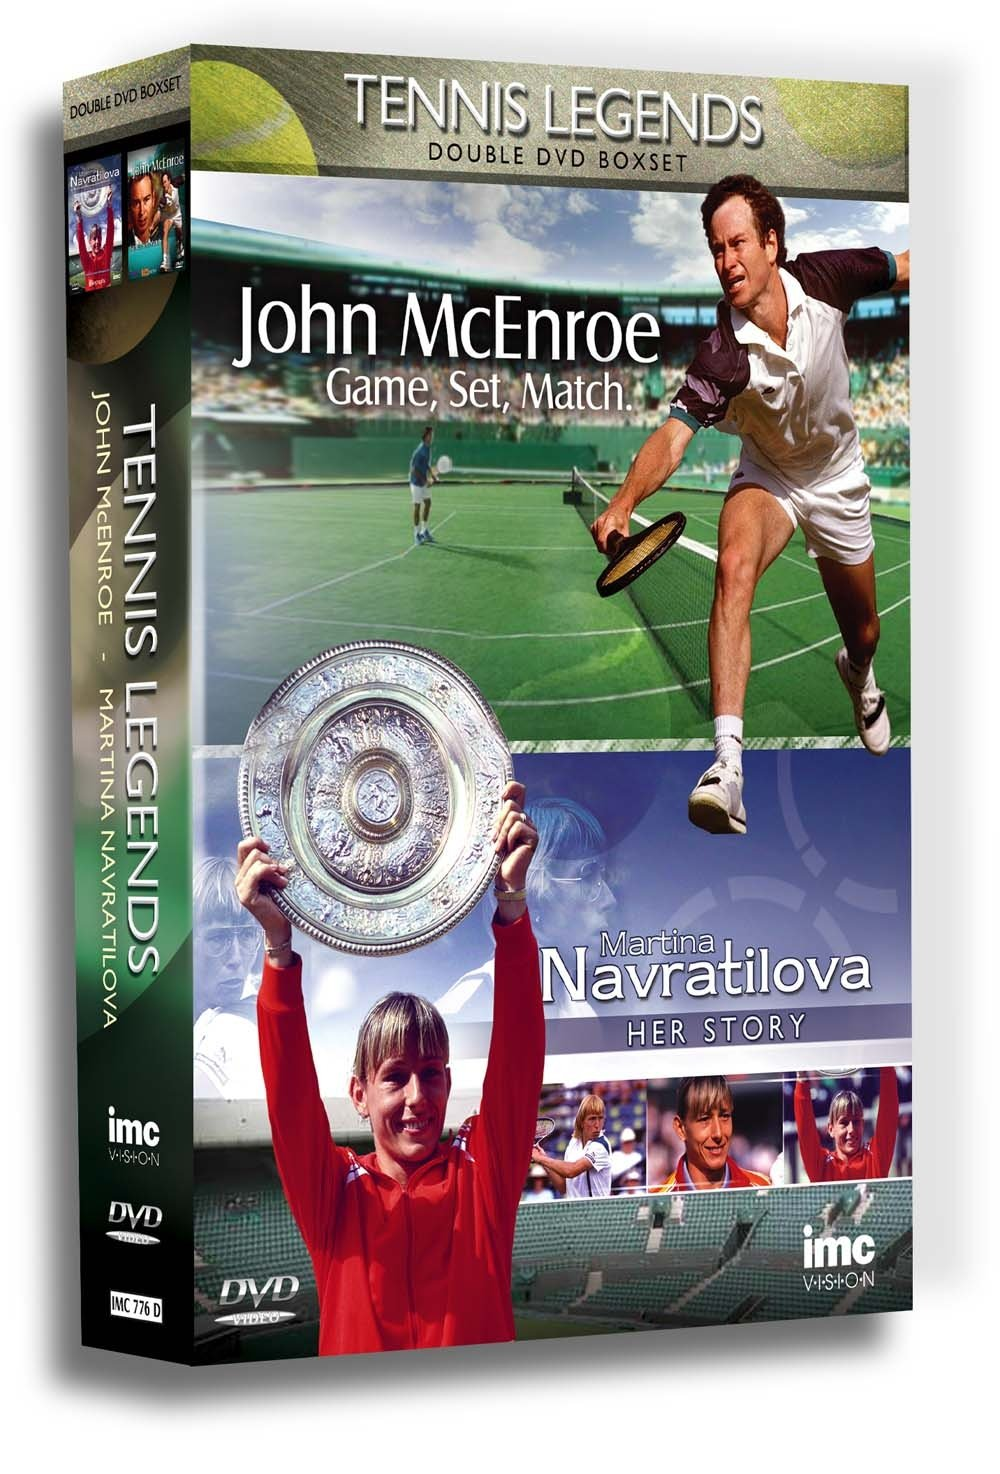 Tennis Legends Double DVD Box Set - John McEnroe - Game, Set & Match and Martina Navratilova - The Story Reino Unido: Amazon.es: John Mcenroe/Martina ...